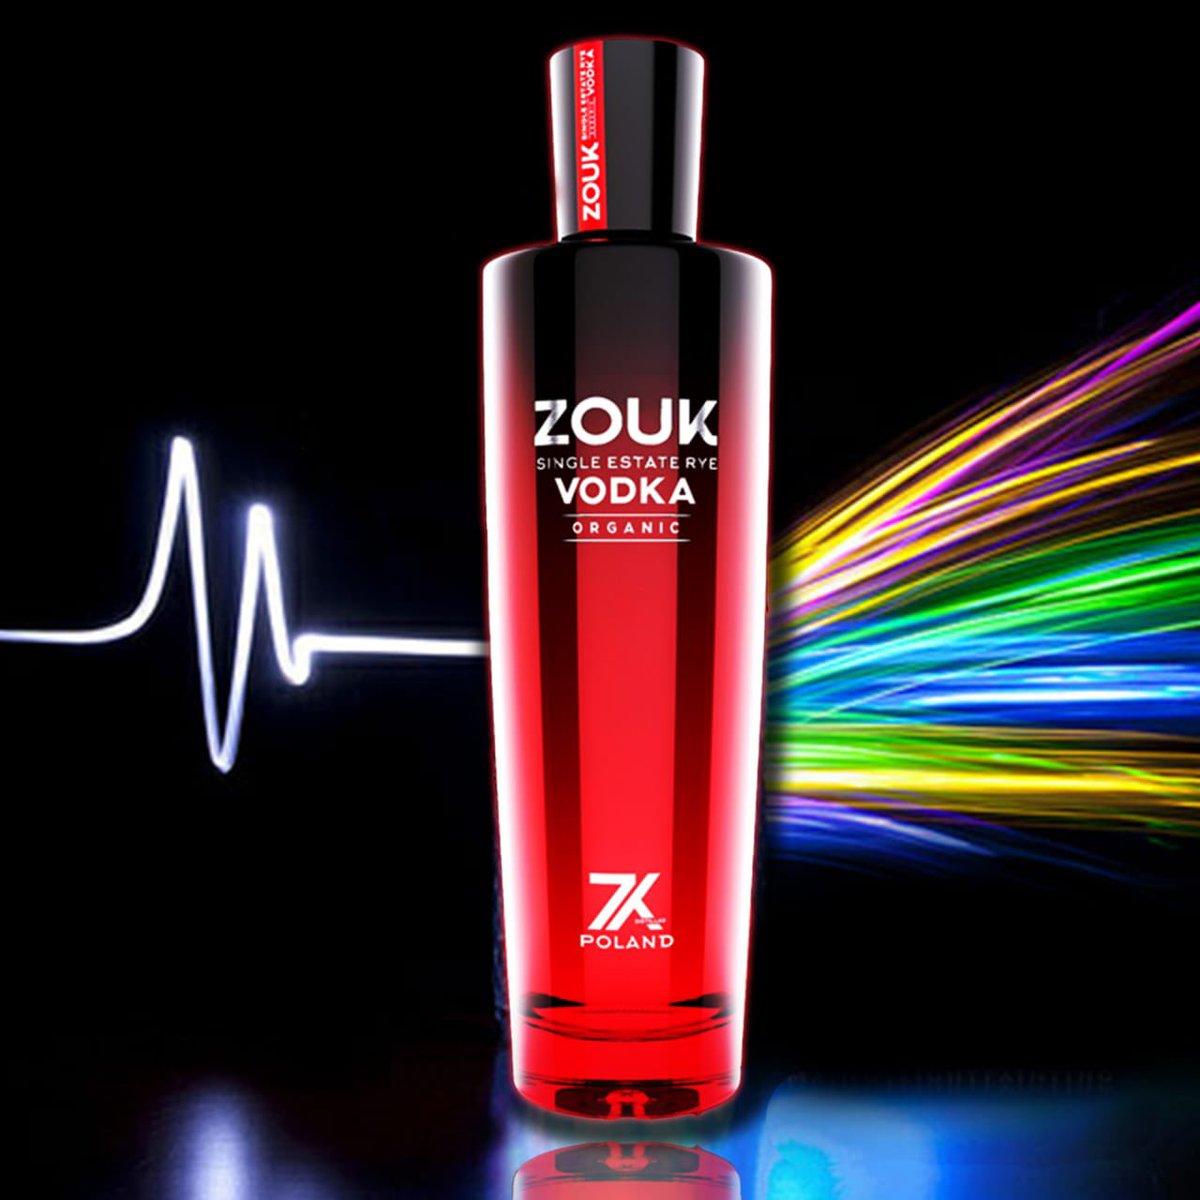 Tipsy Wednesday with Zouk Vodka   #zoukvodka #wednesdayvibes #vodka🍸 #eveningvibes